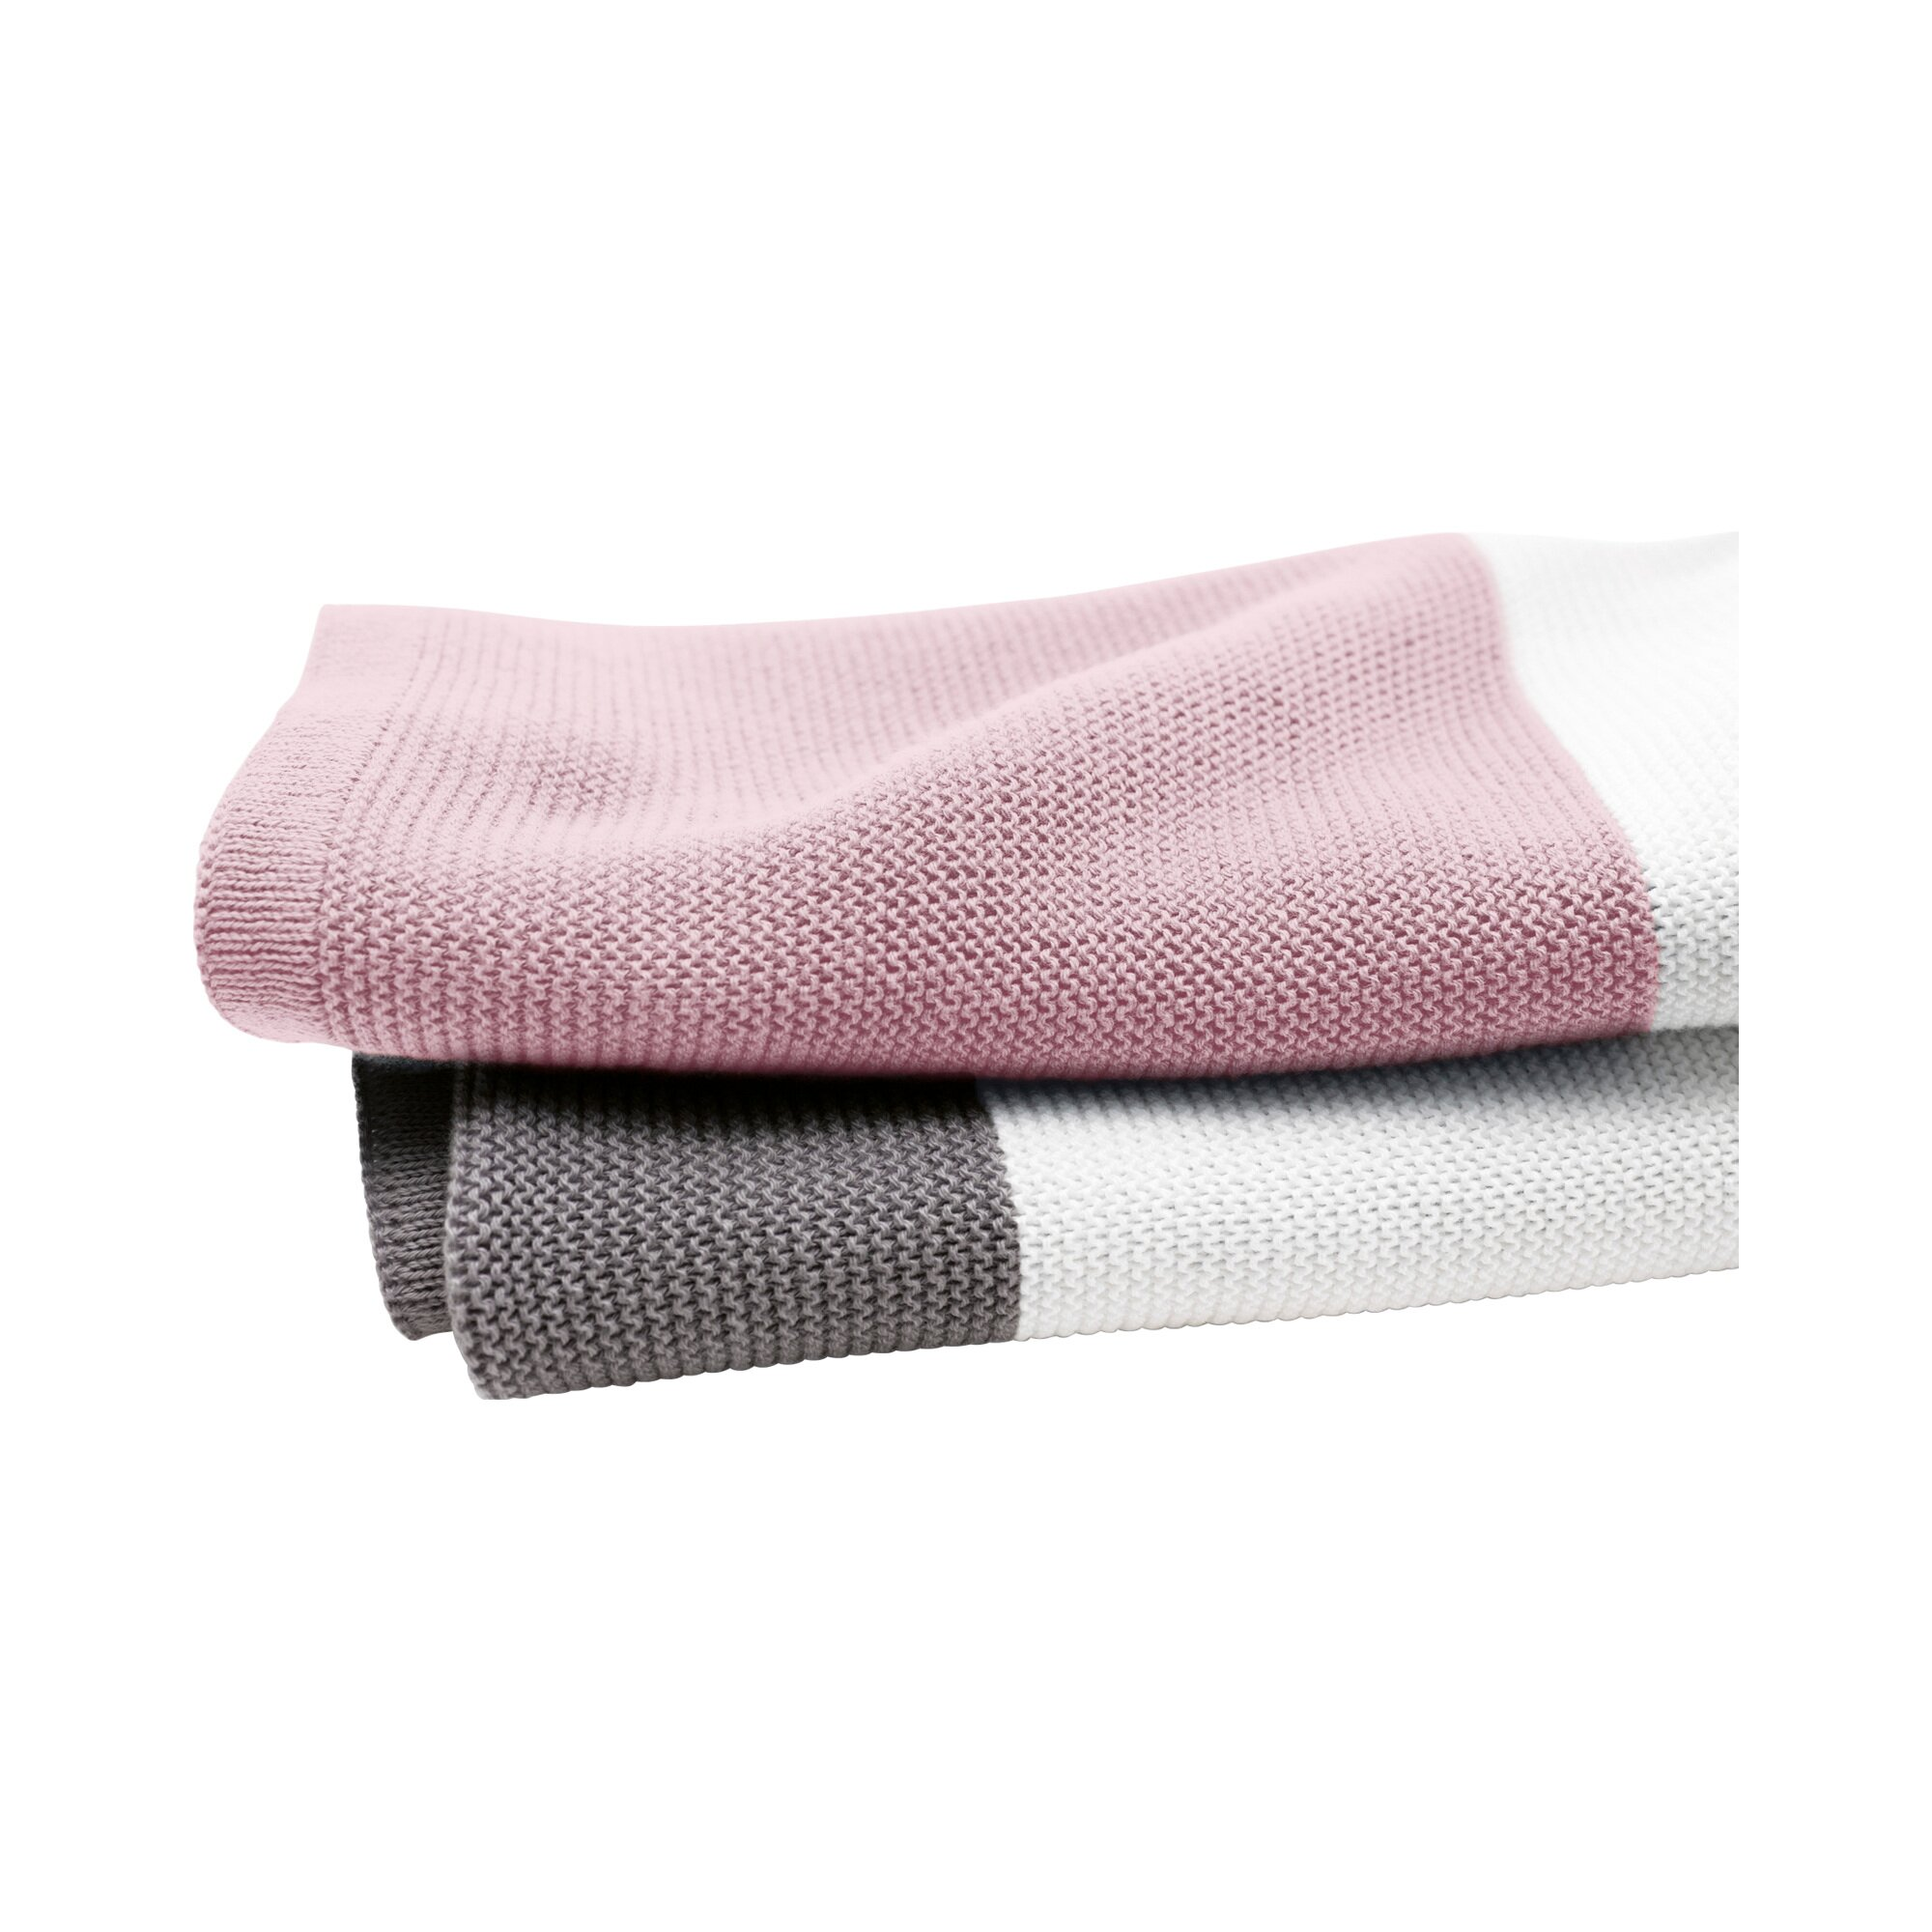 bugaboo-kinderwagendecke-80-x-100-cm-pink